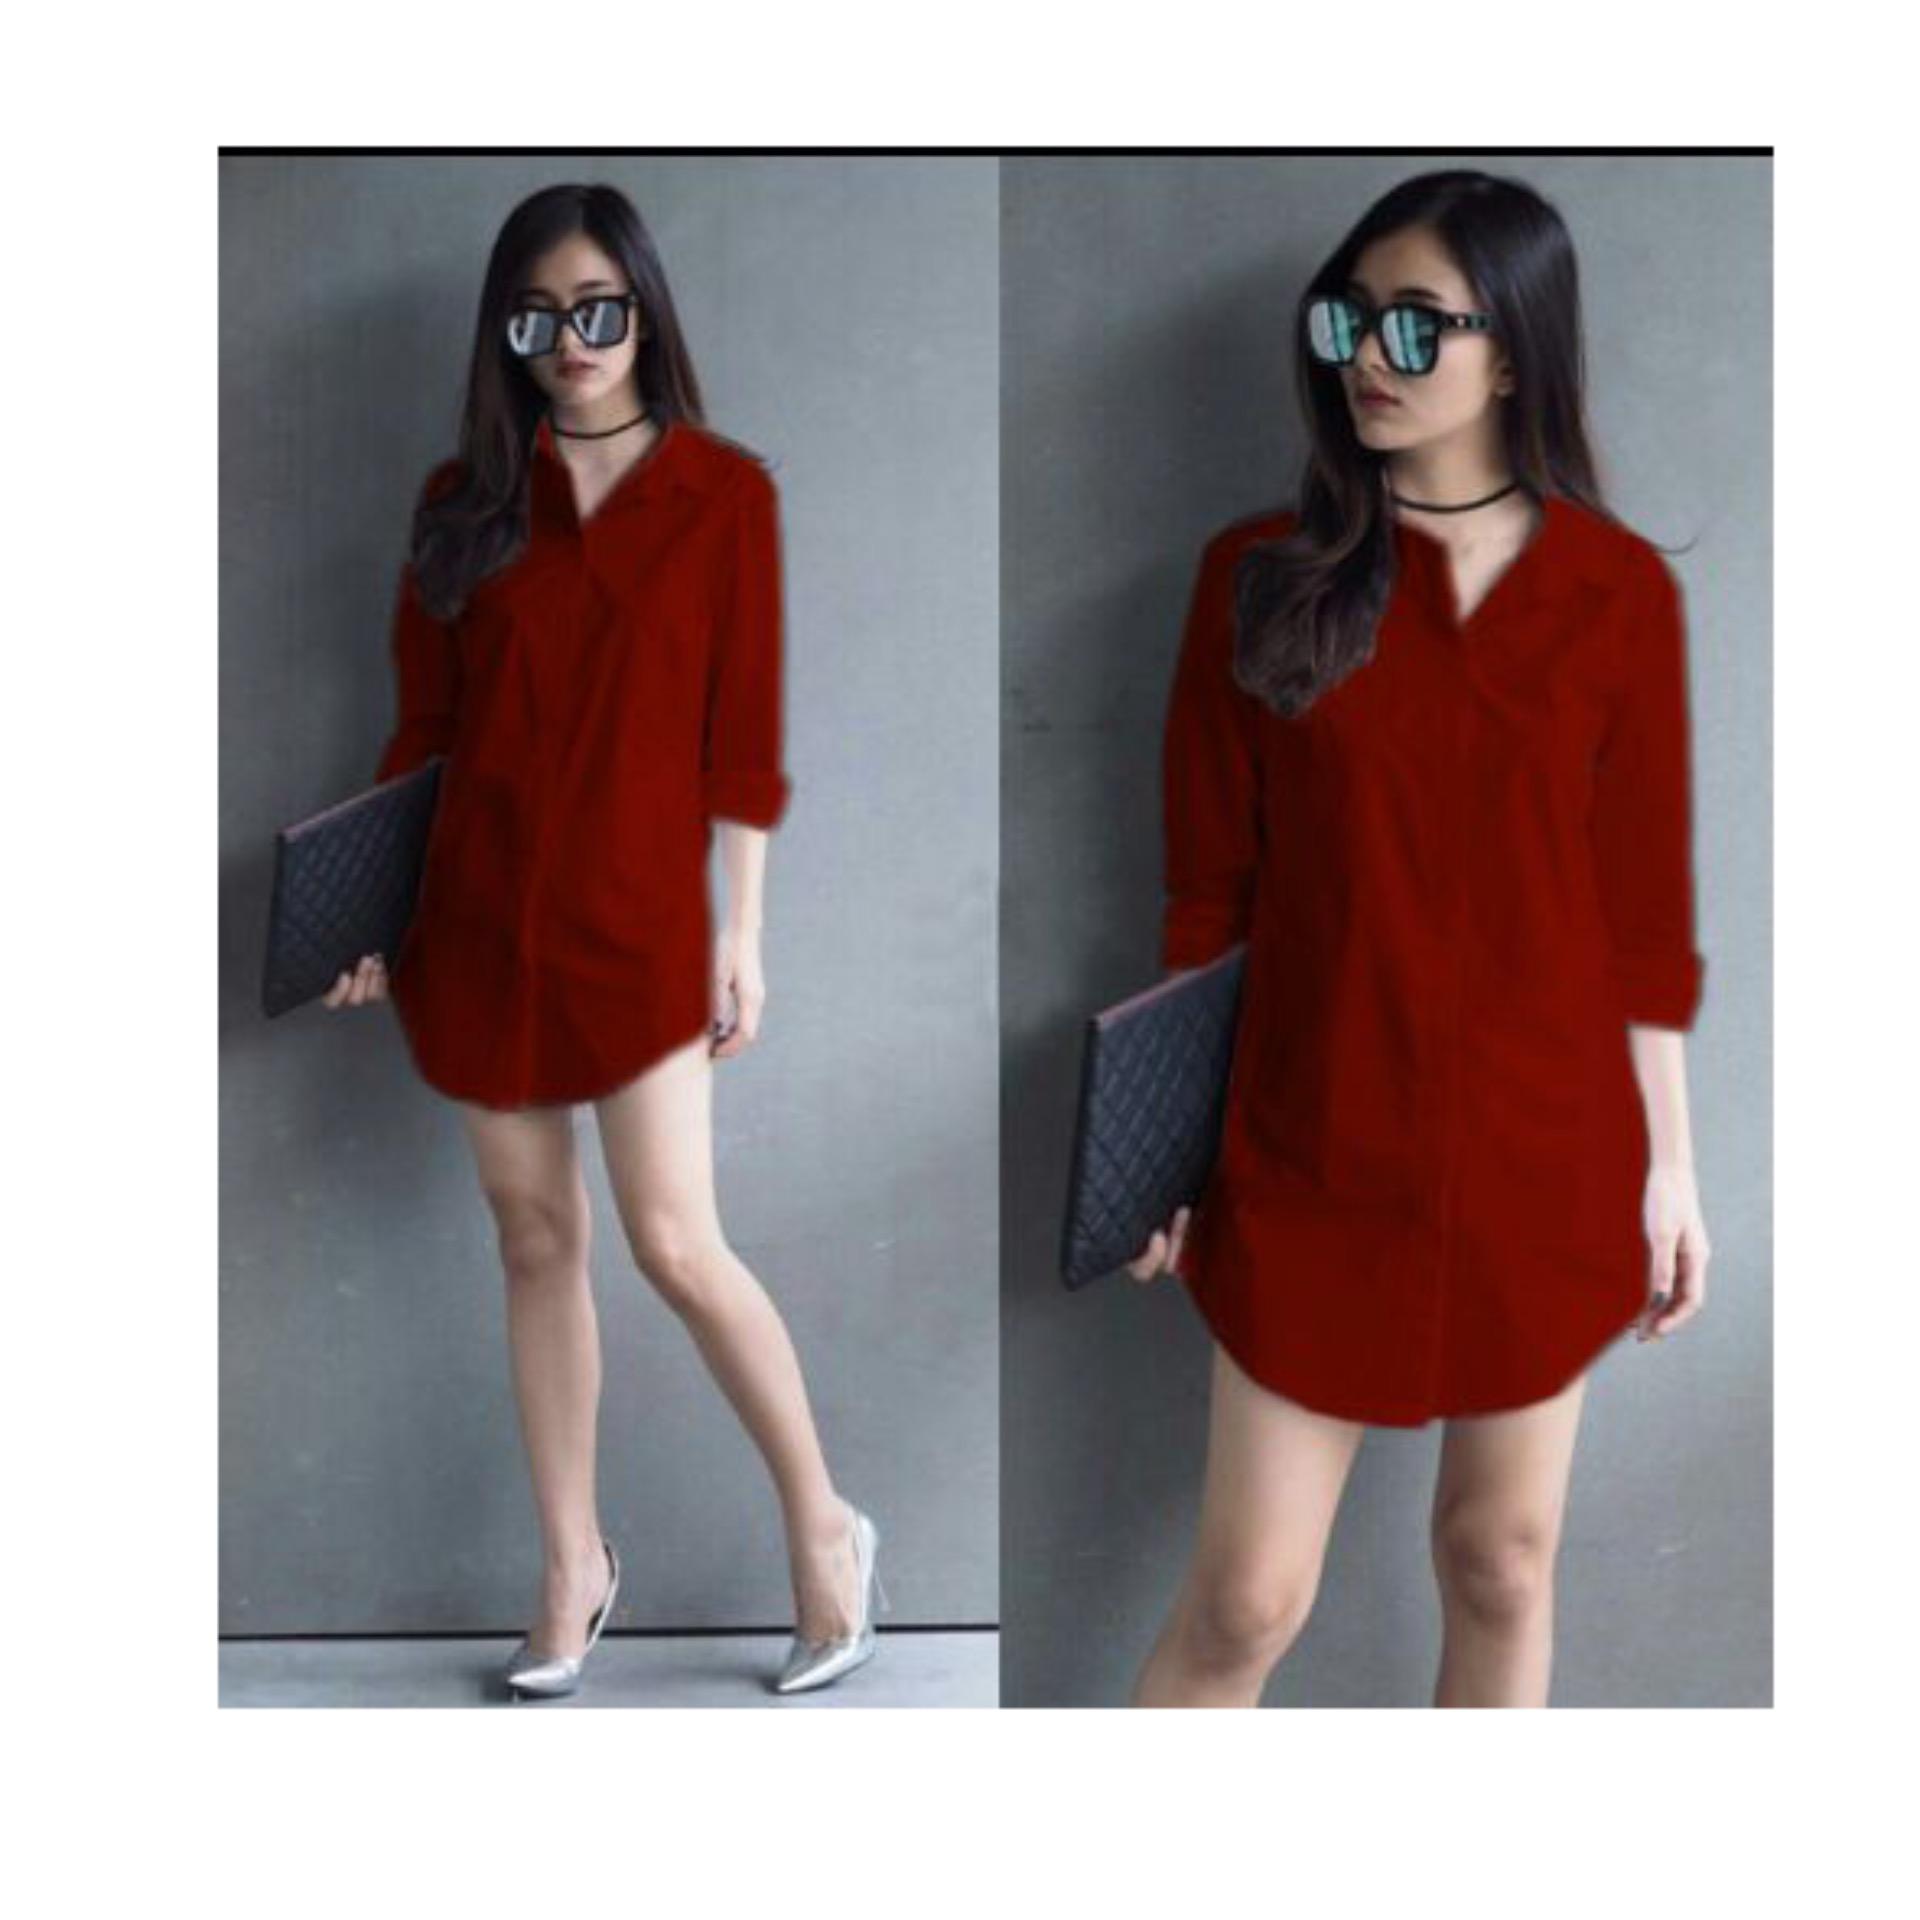 Fashionable F Fashion Tunik Wanita Shinta - Maroon   Baju Wanita   Blouse  Korea   Atasan Wanita 74e60d8ea3